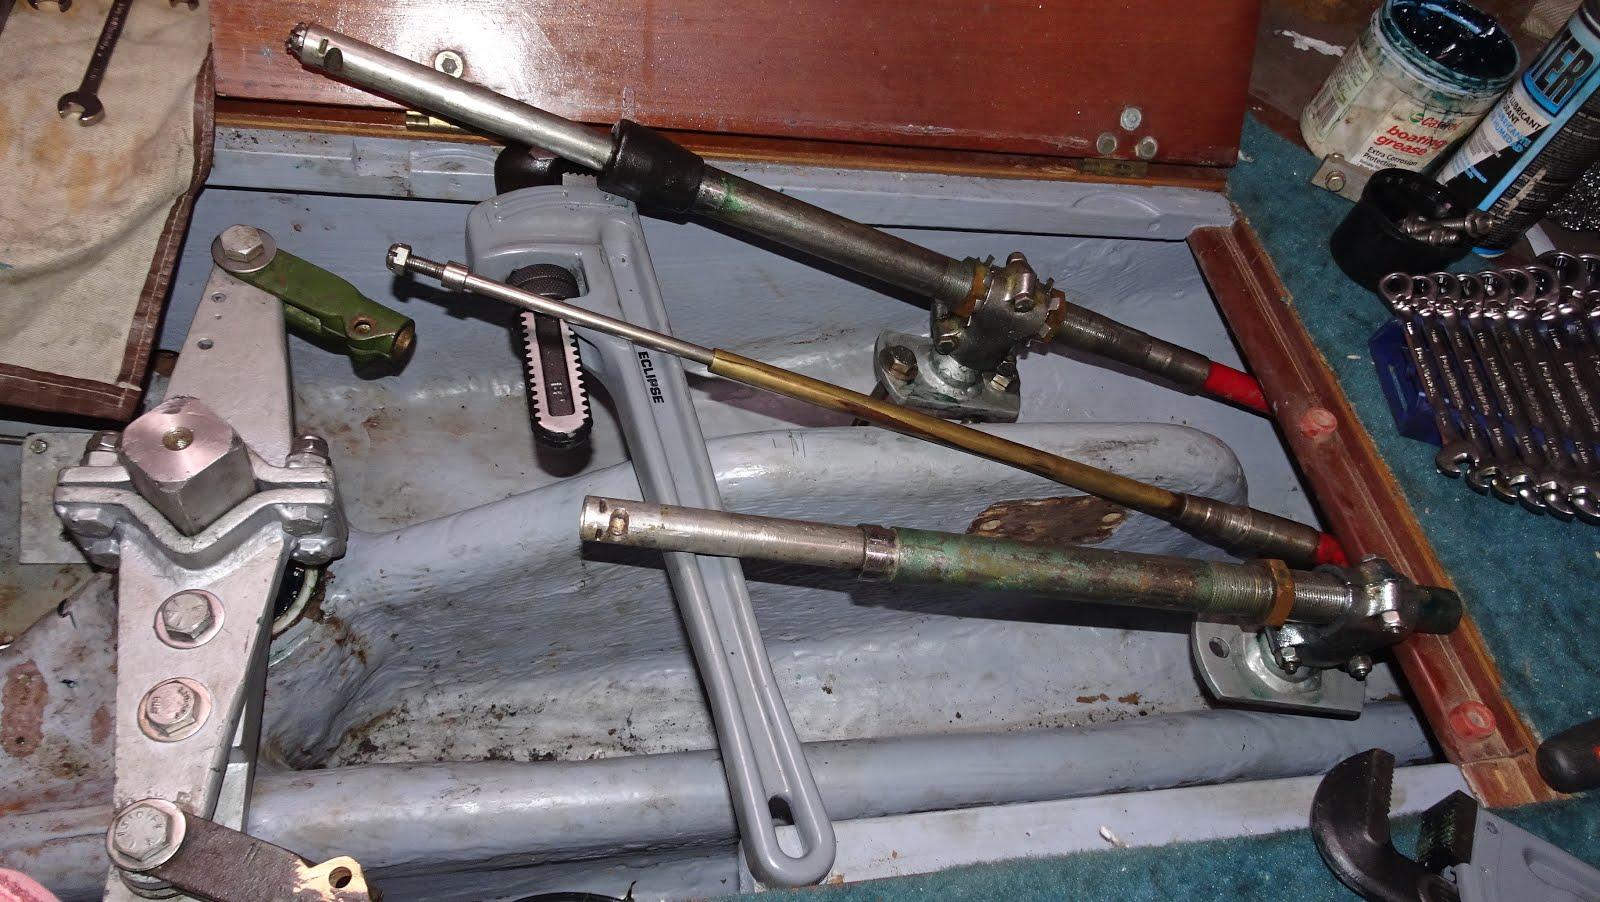 Profesional Electric Soldering Iron Gun Circuit Bo End 9 25 2016 215